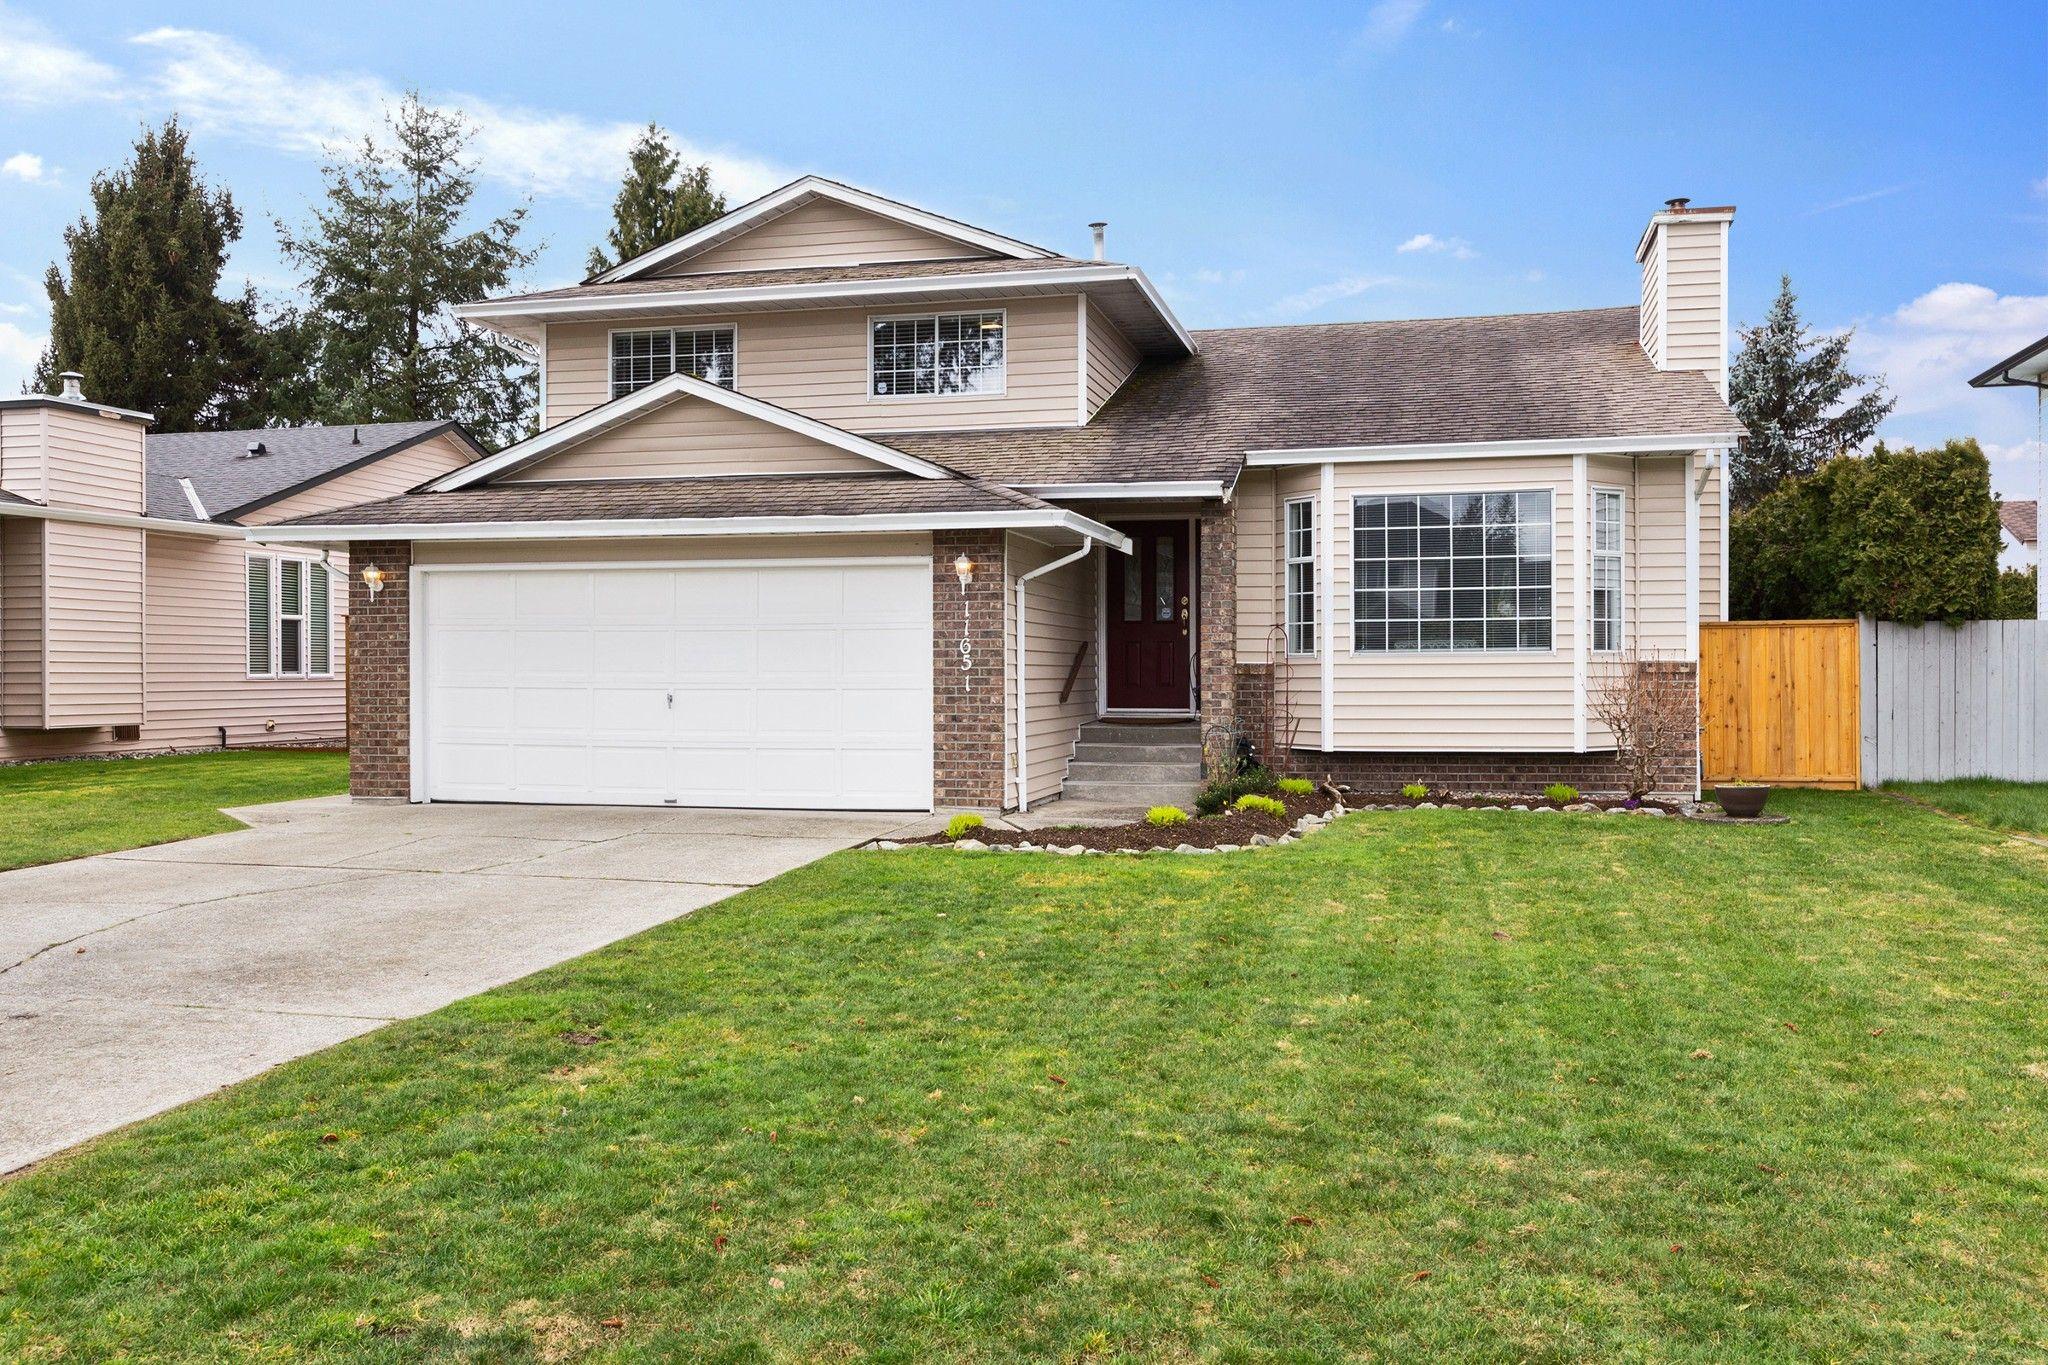 Main Photo: 11651 MILLER Street in Maple Ridge: Southwest Maple Ridge House for sale : MLS®# R2555254